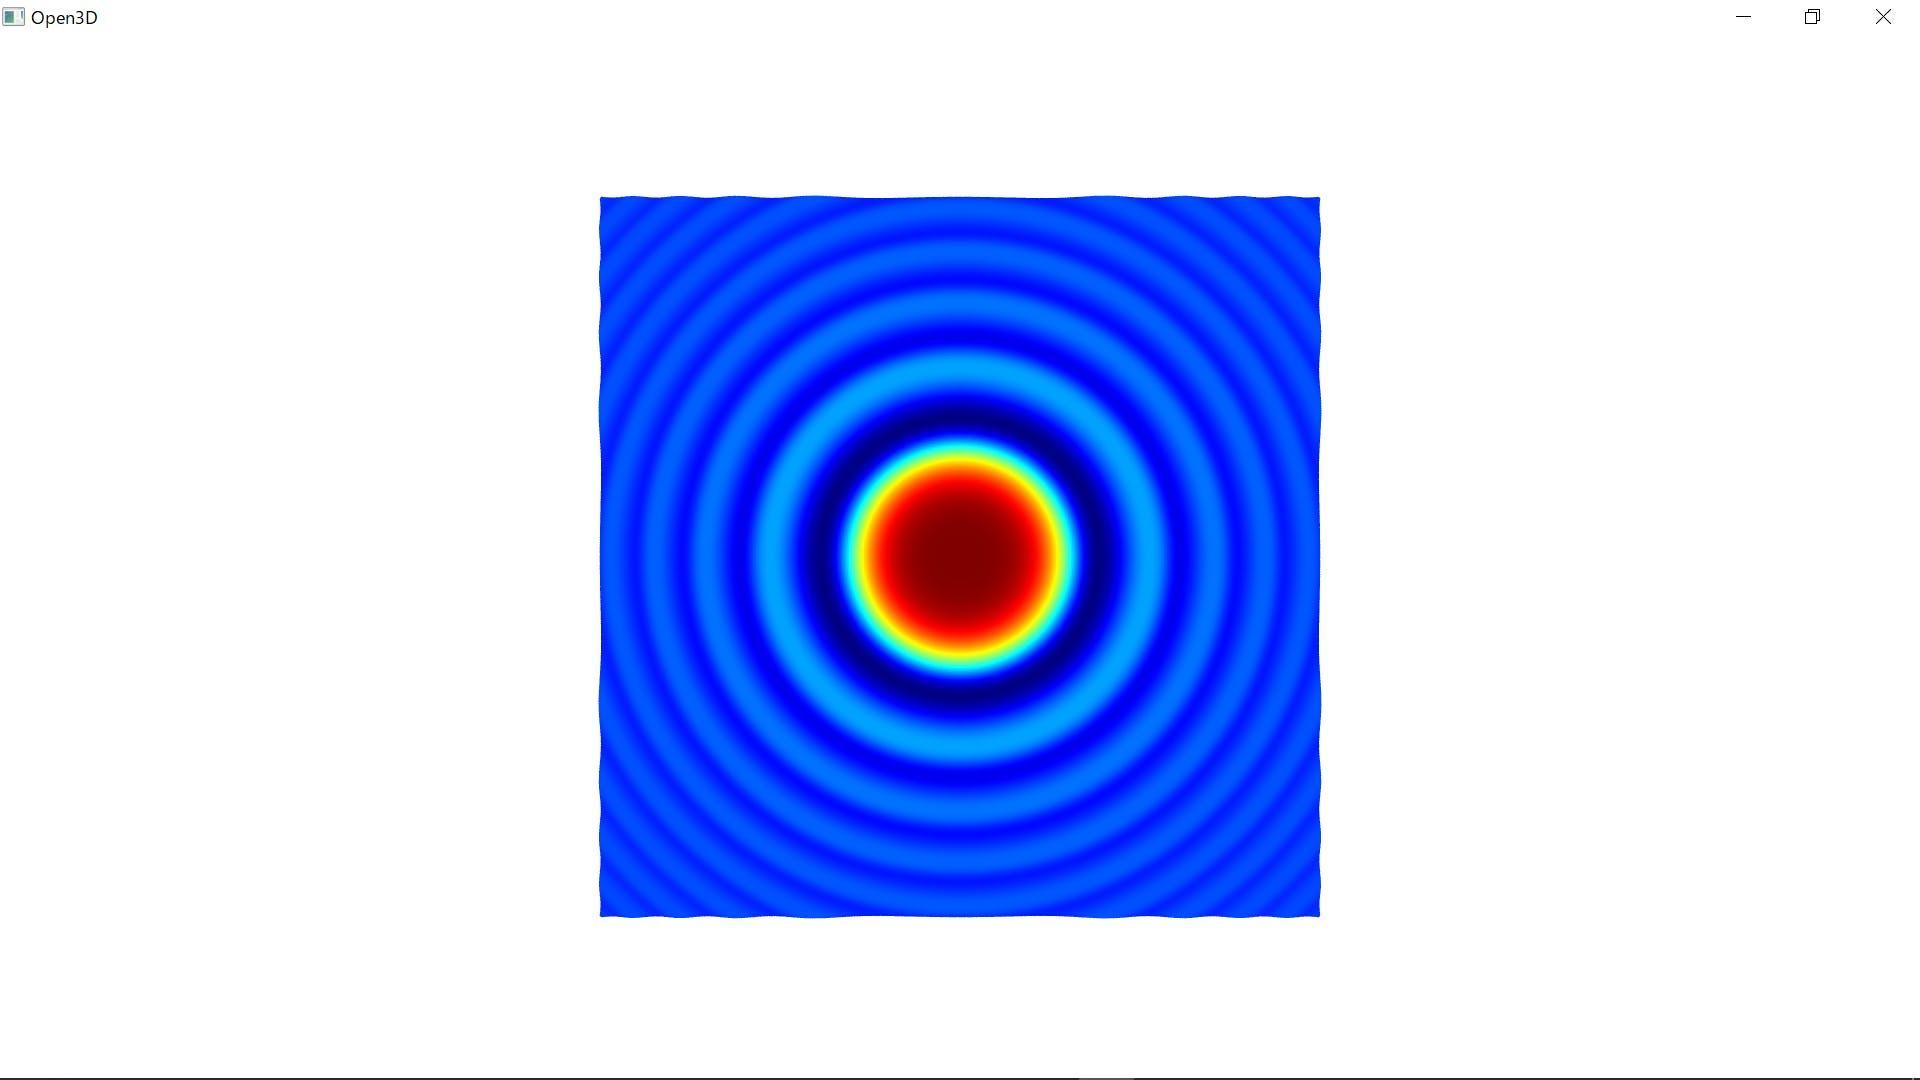 PythonでOpen3Dやーる(Python 3 6 5、Open3D v0 4 0) - Qiita